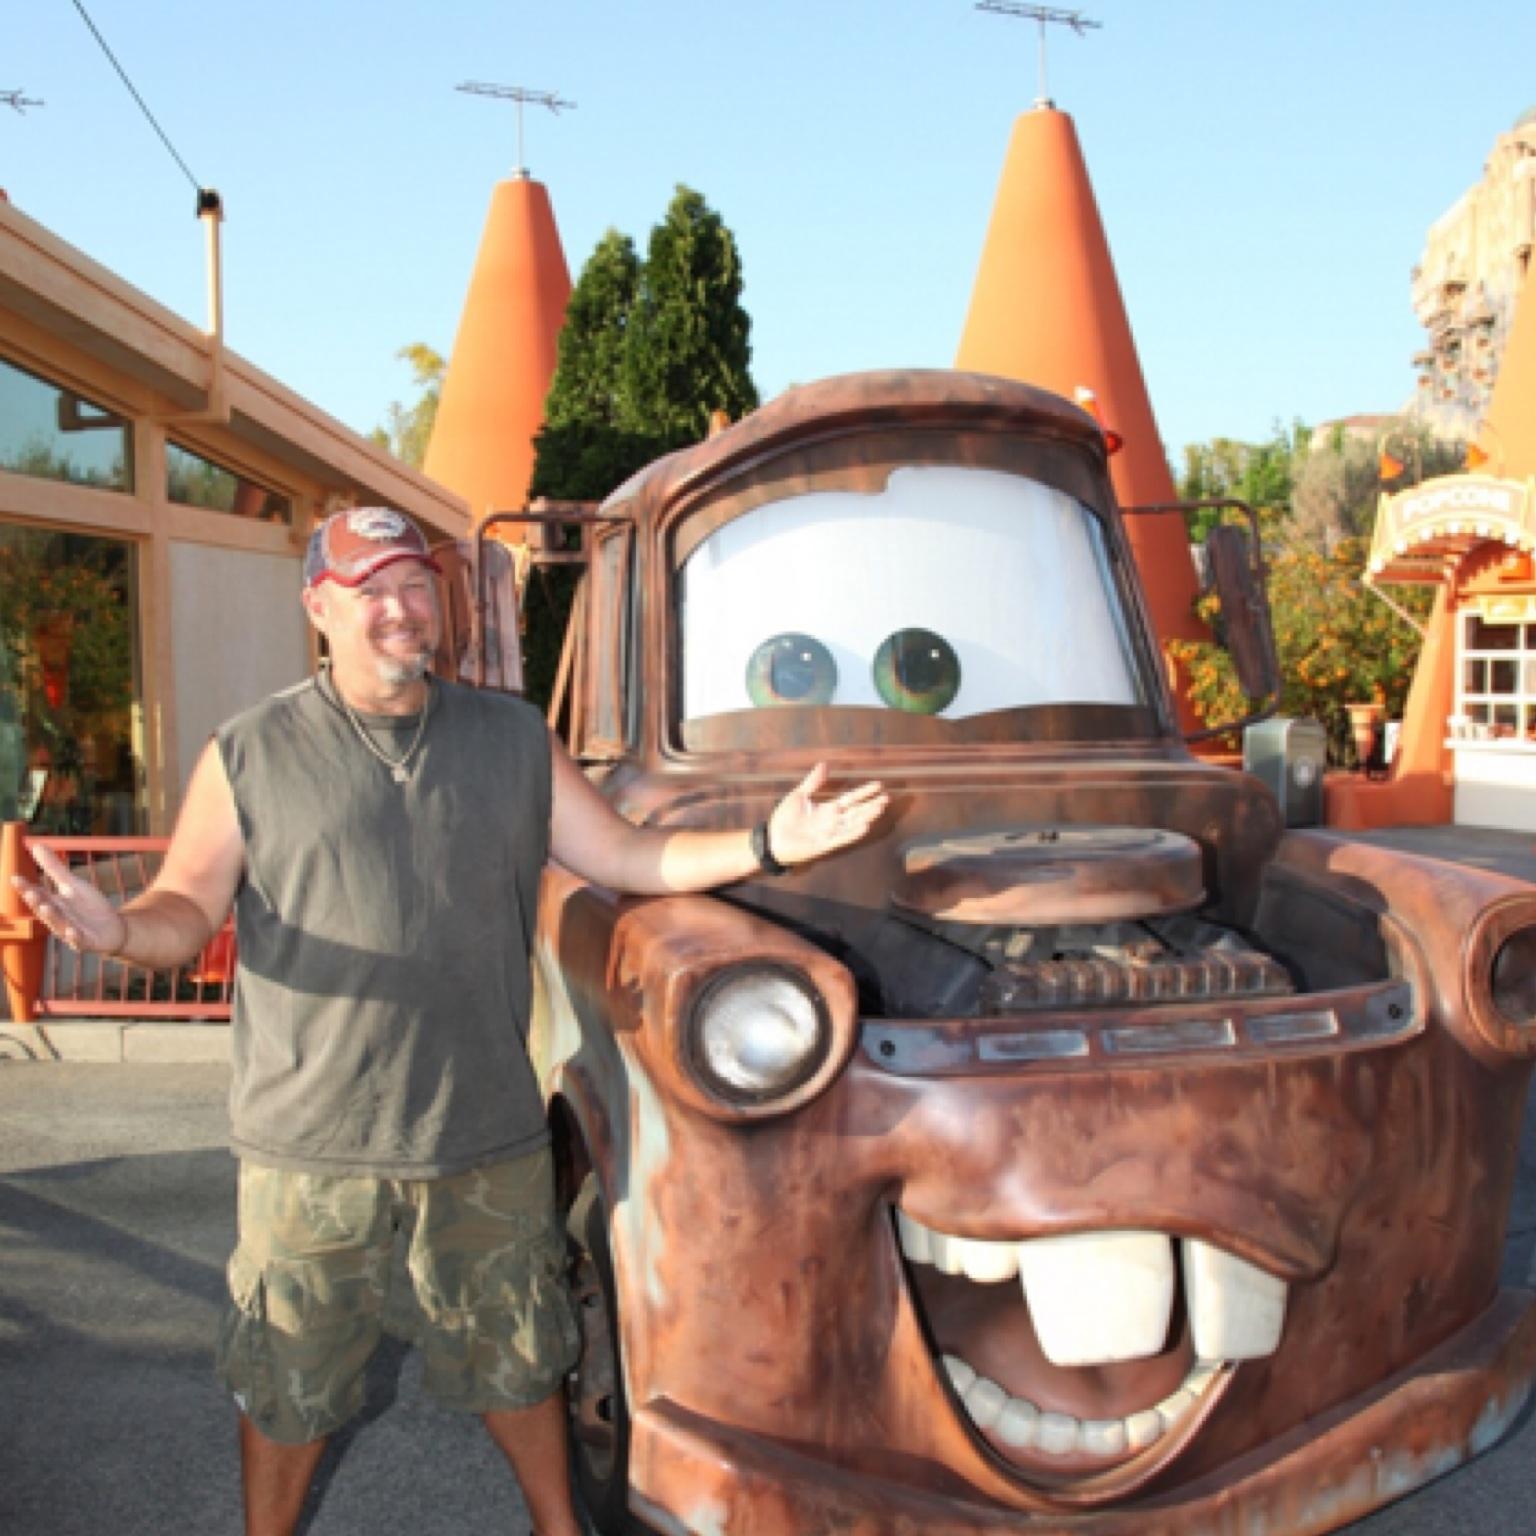 cars land pixar wiki fandom powered by wikia. Black Bedroom Furniture Sets. Home Design Ideas